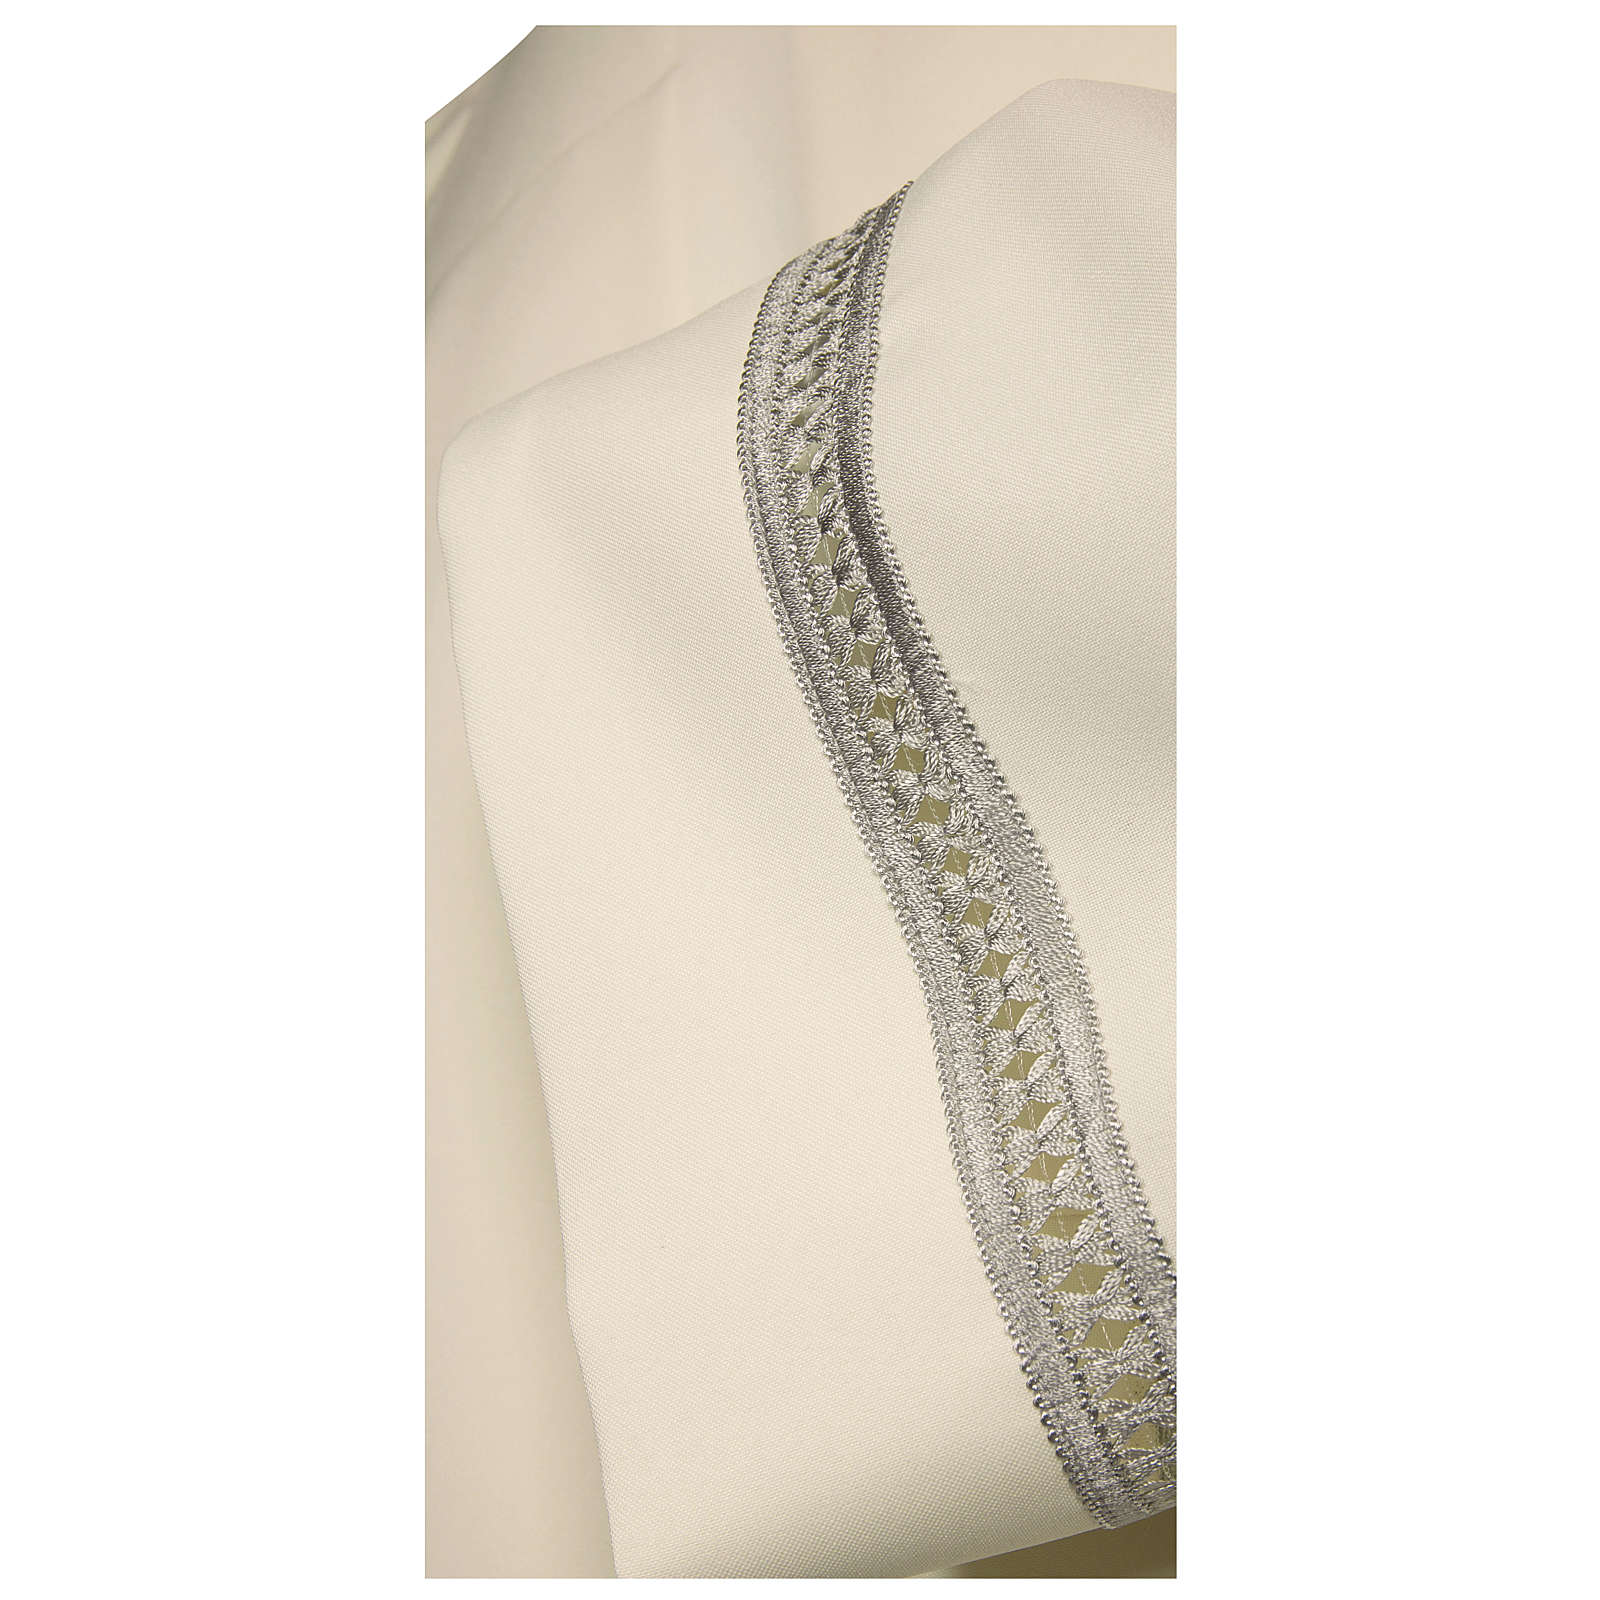 Alba 65% poliéster 35% algodón marfil alfiletero plata máquina cremallera hombro 4